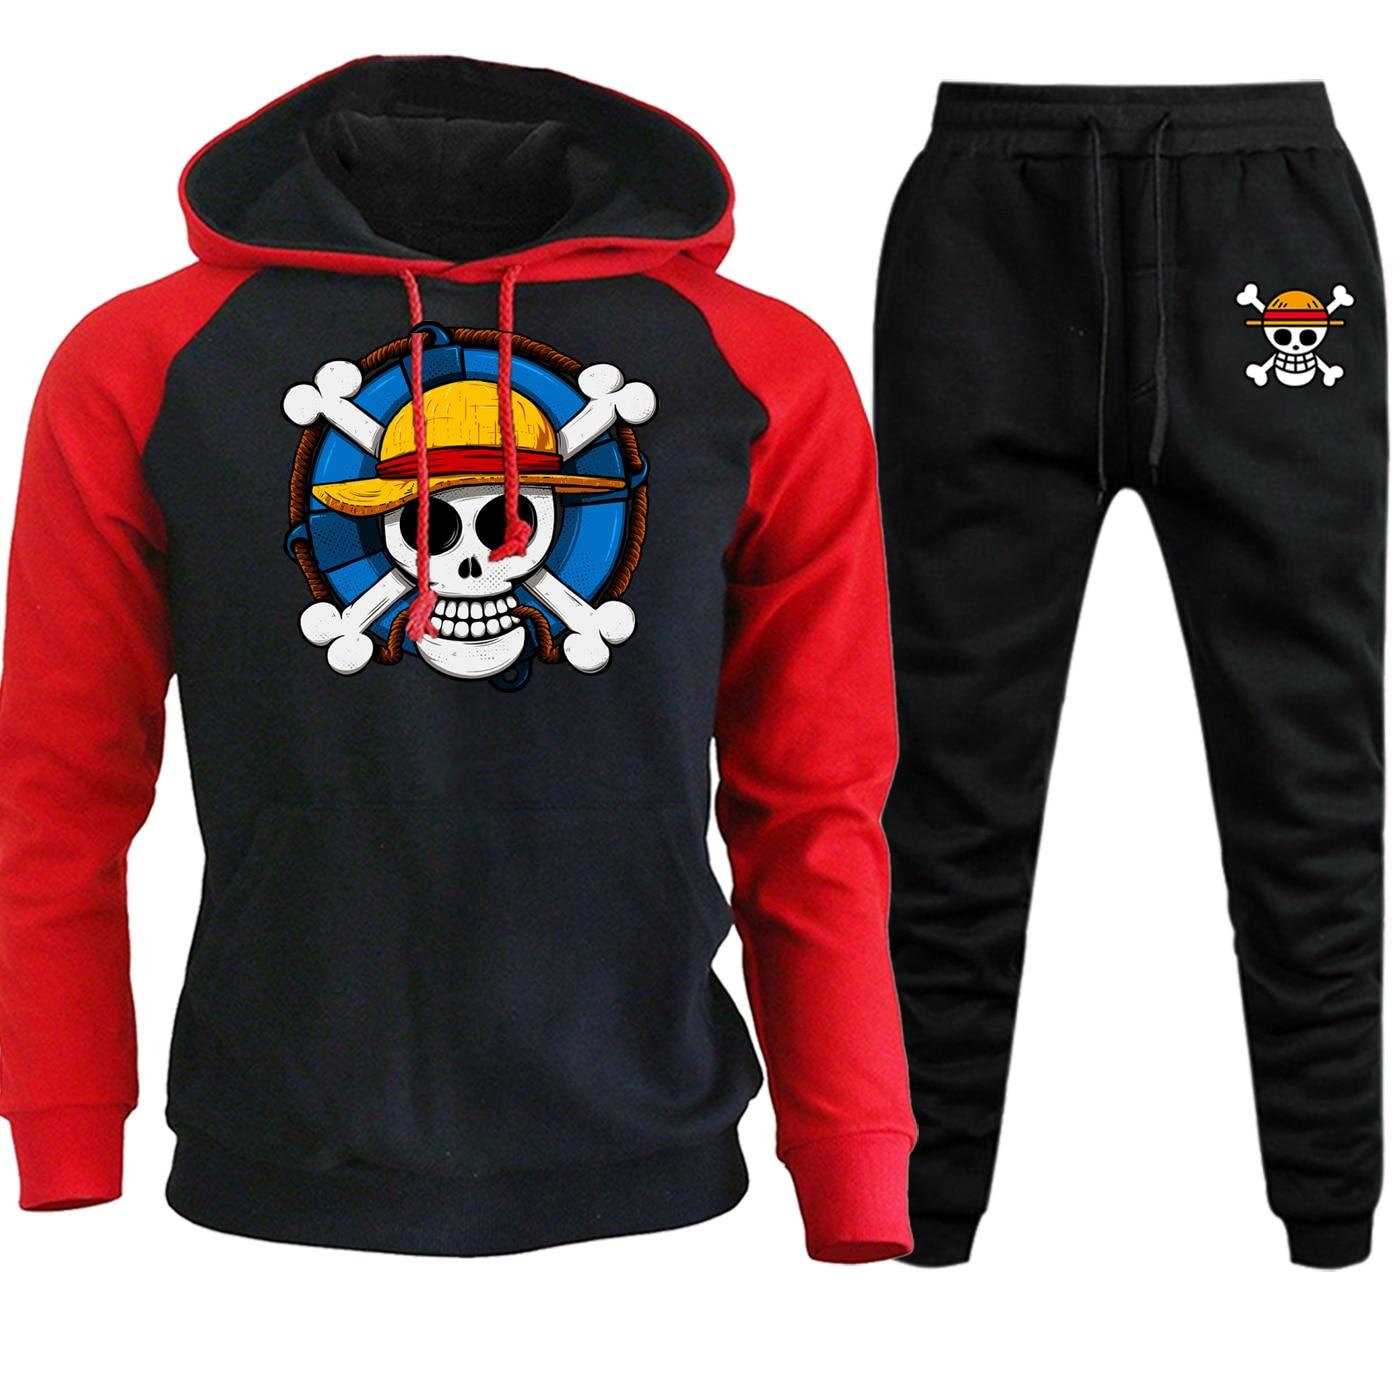 Funny Cartoon Printed Raglan Hooded Mens Streetwear Hot Sale Autumn Winter One Piece Japan Anime Suit Hoodies+Pants 2 Piece Set